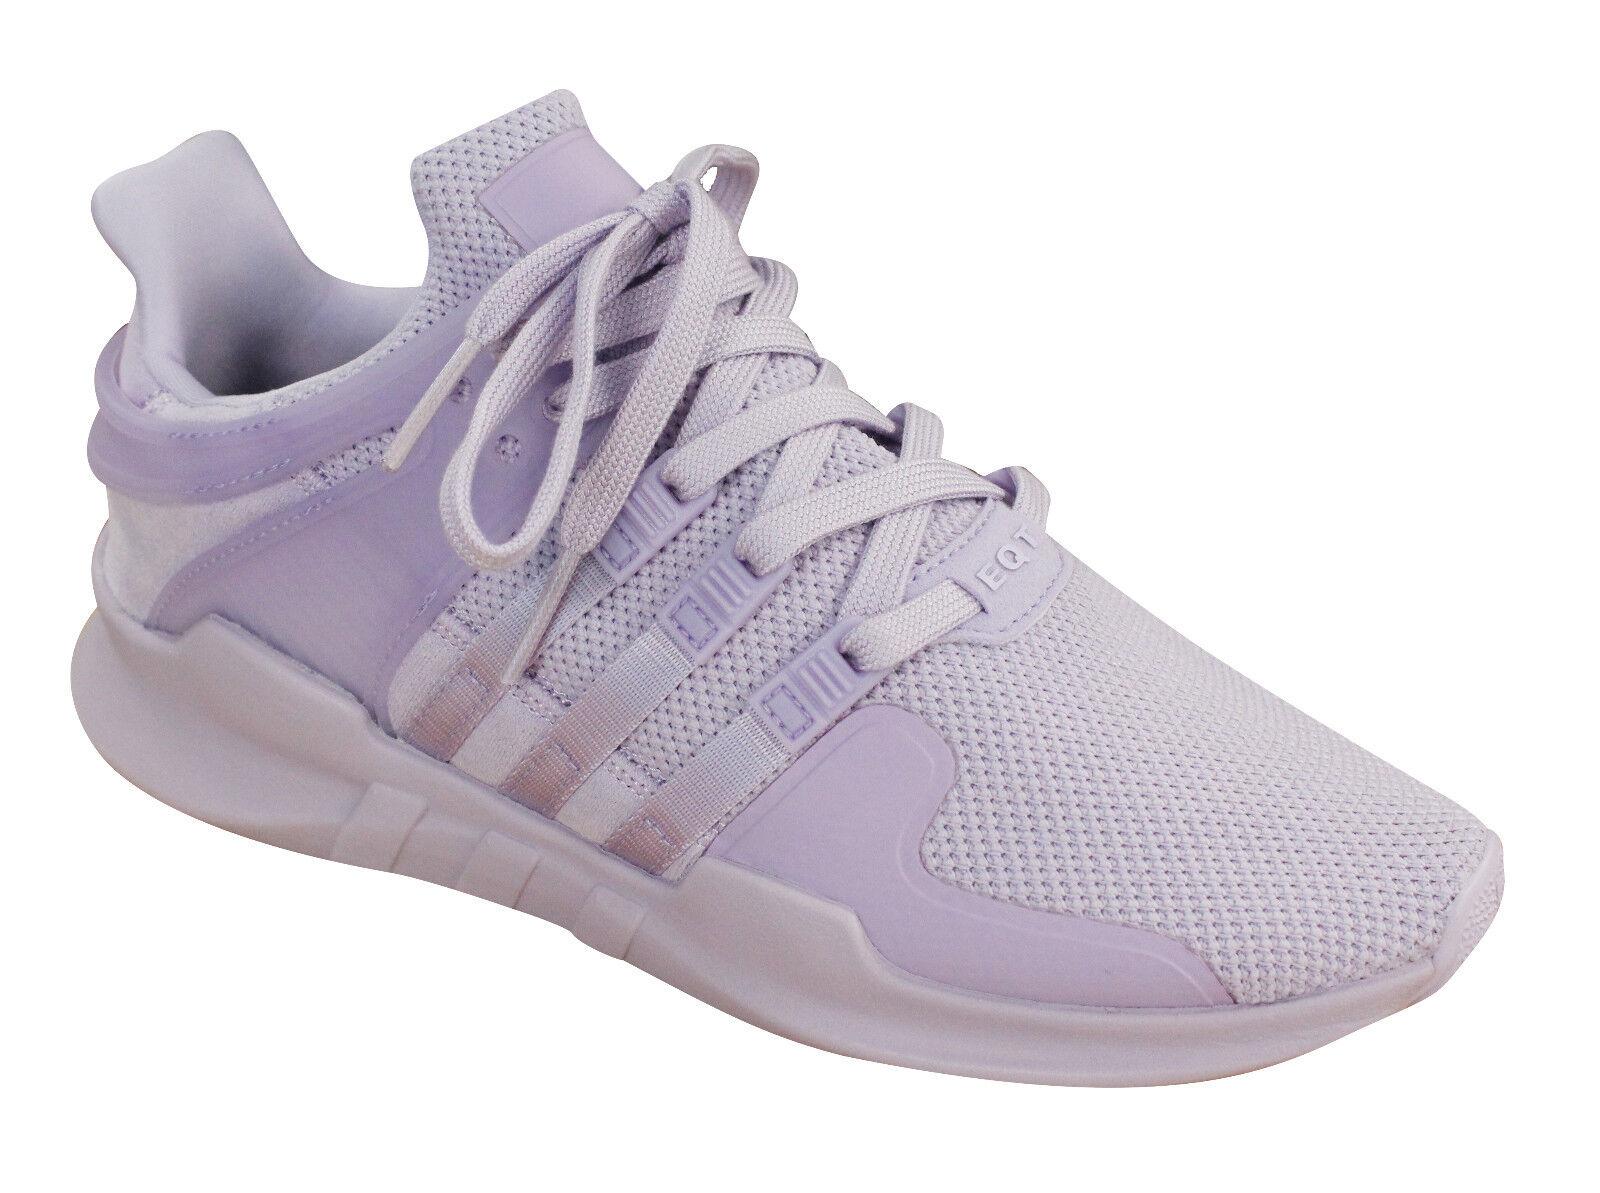 Adidas Originals Equipment Support Adv Damenschuhe Trainers Purple Textile BY9109 P5